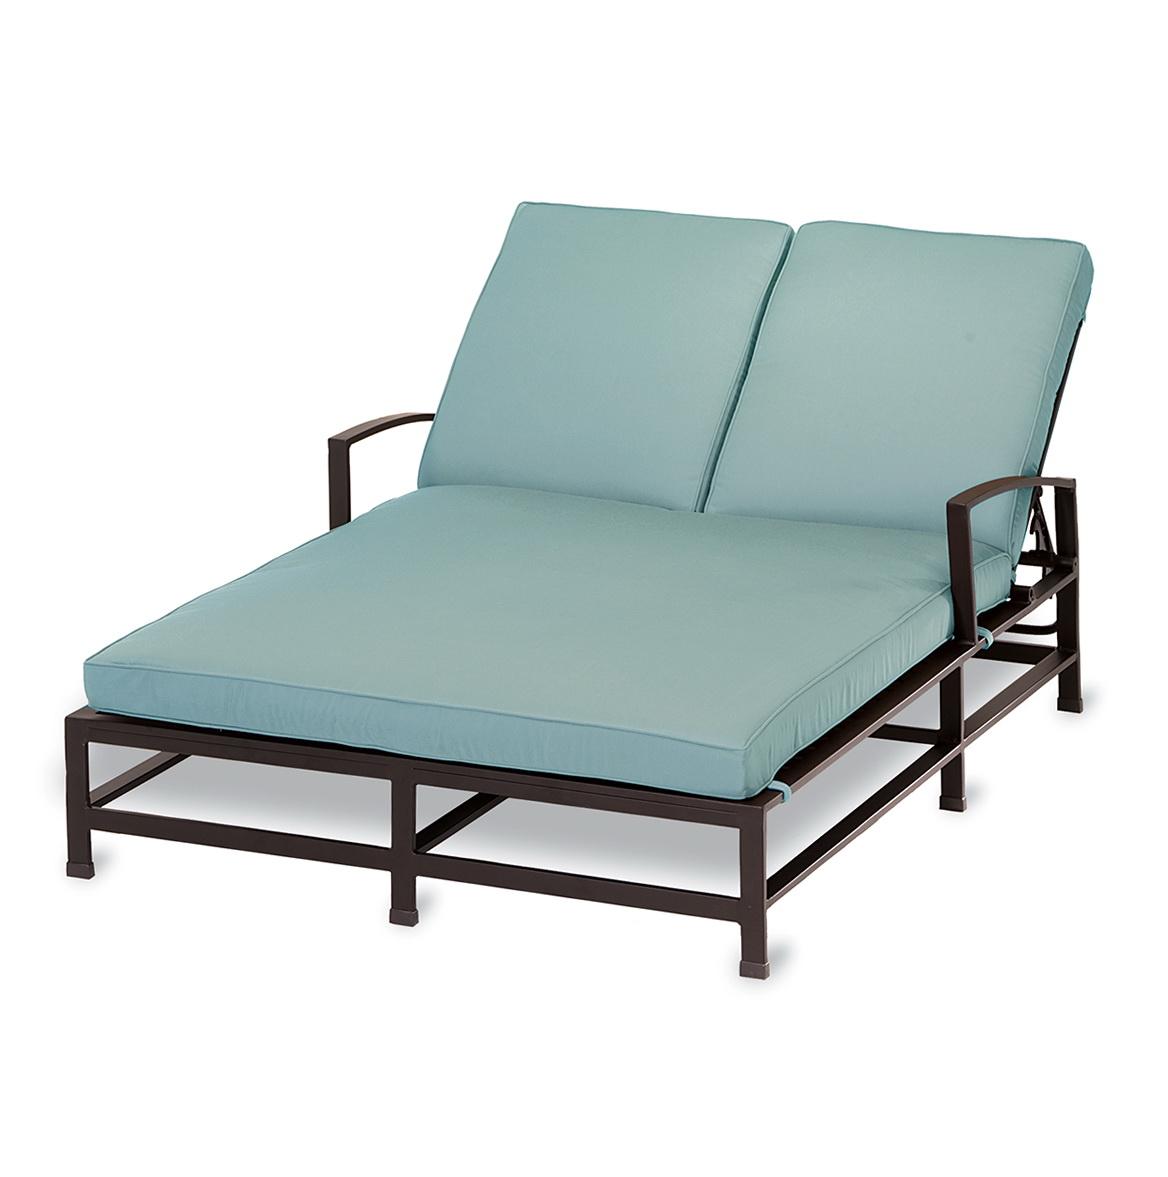 Double Chaise Lounge Cushion